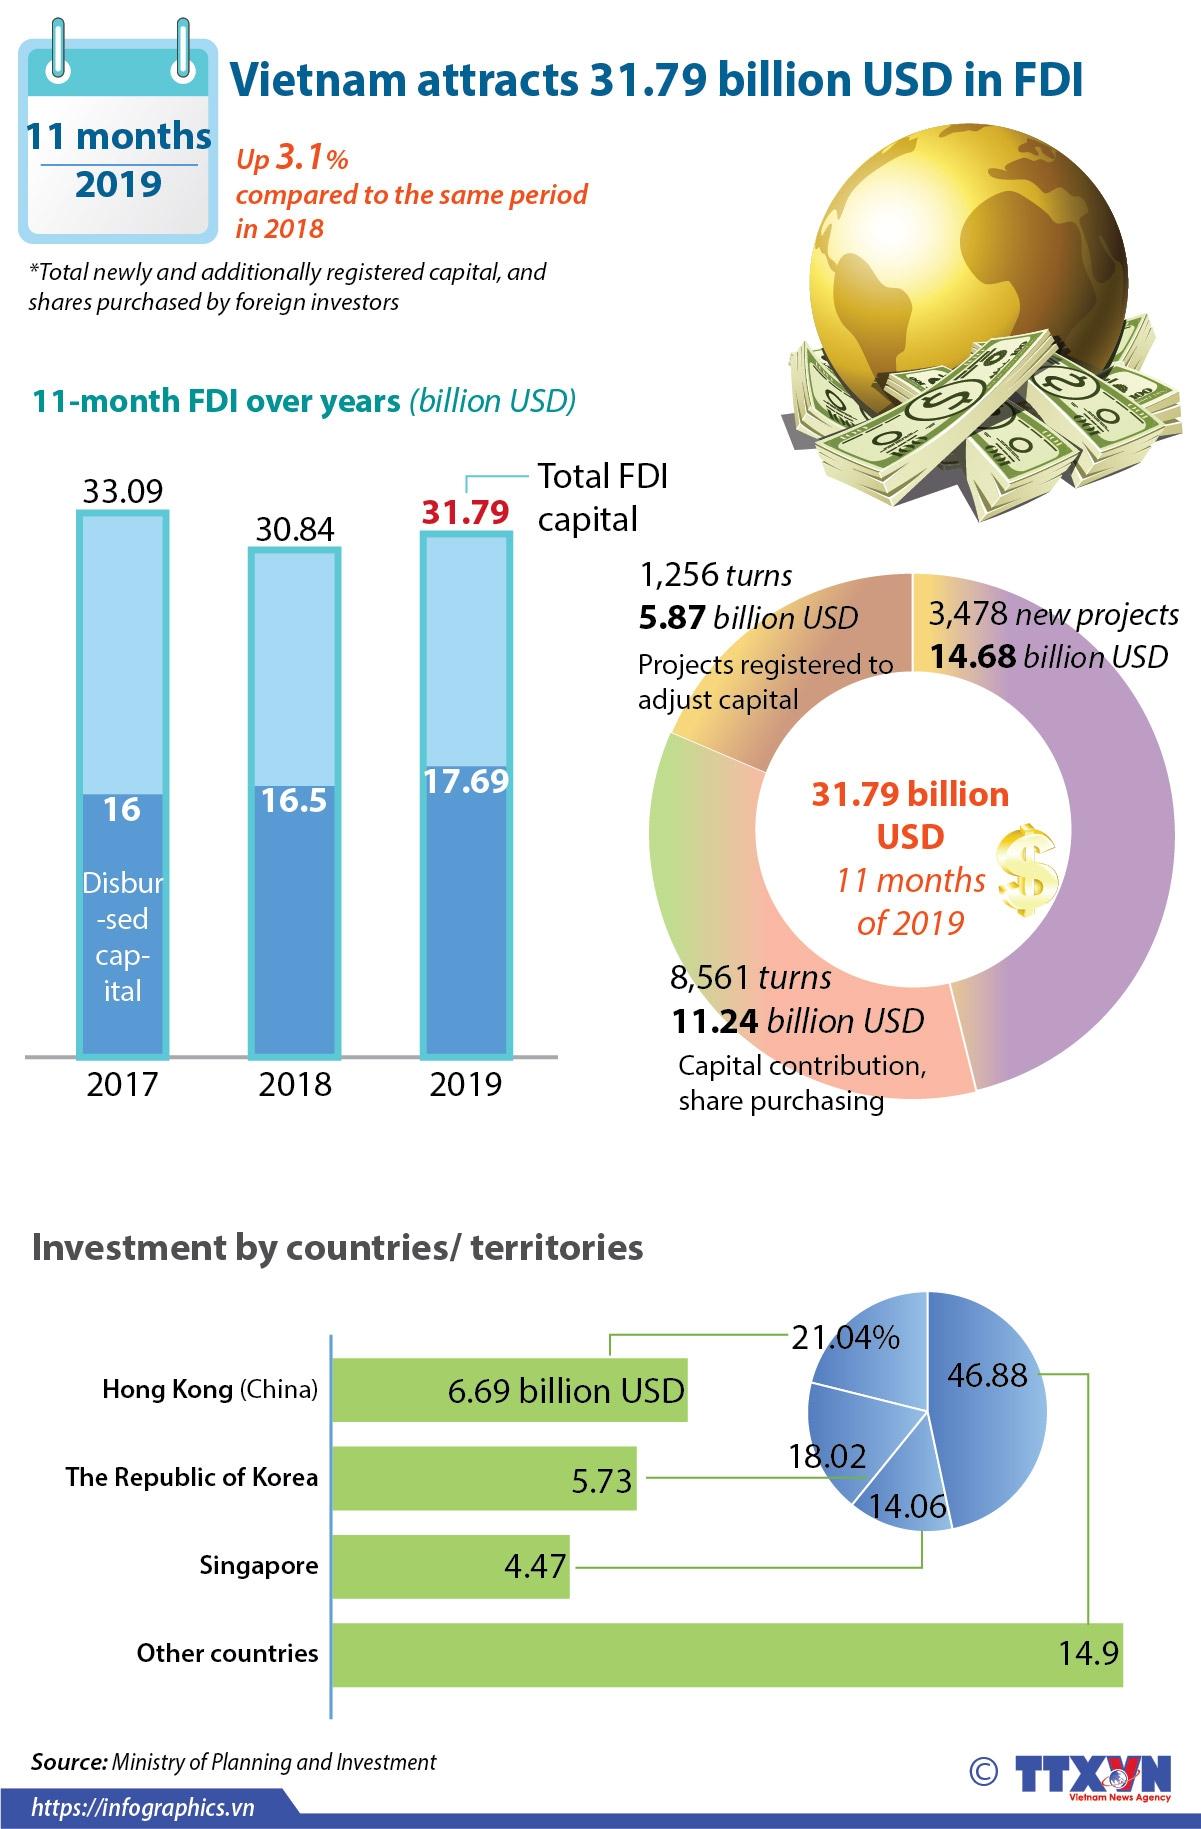 vietnam attracts 3179 billion usd in fdi